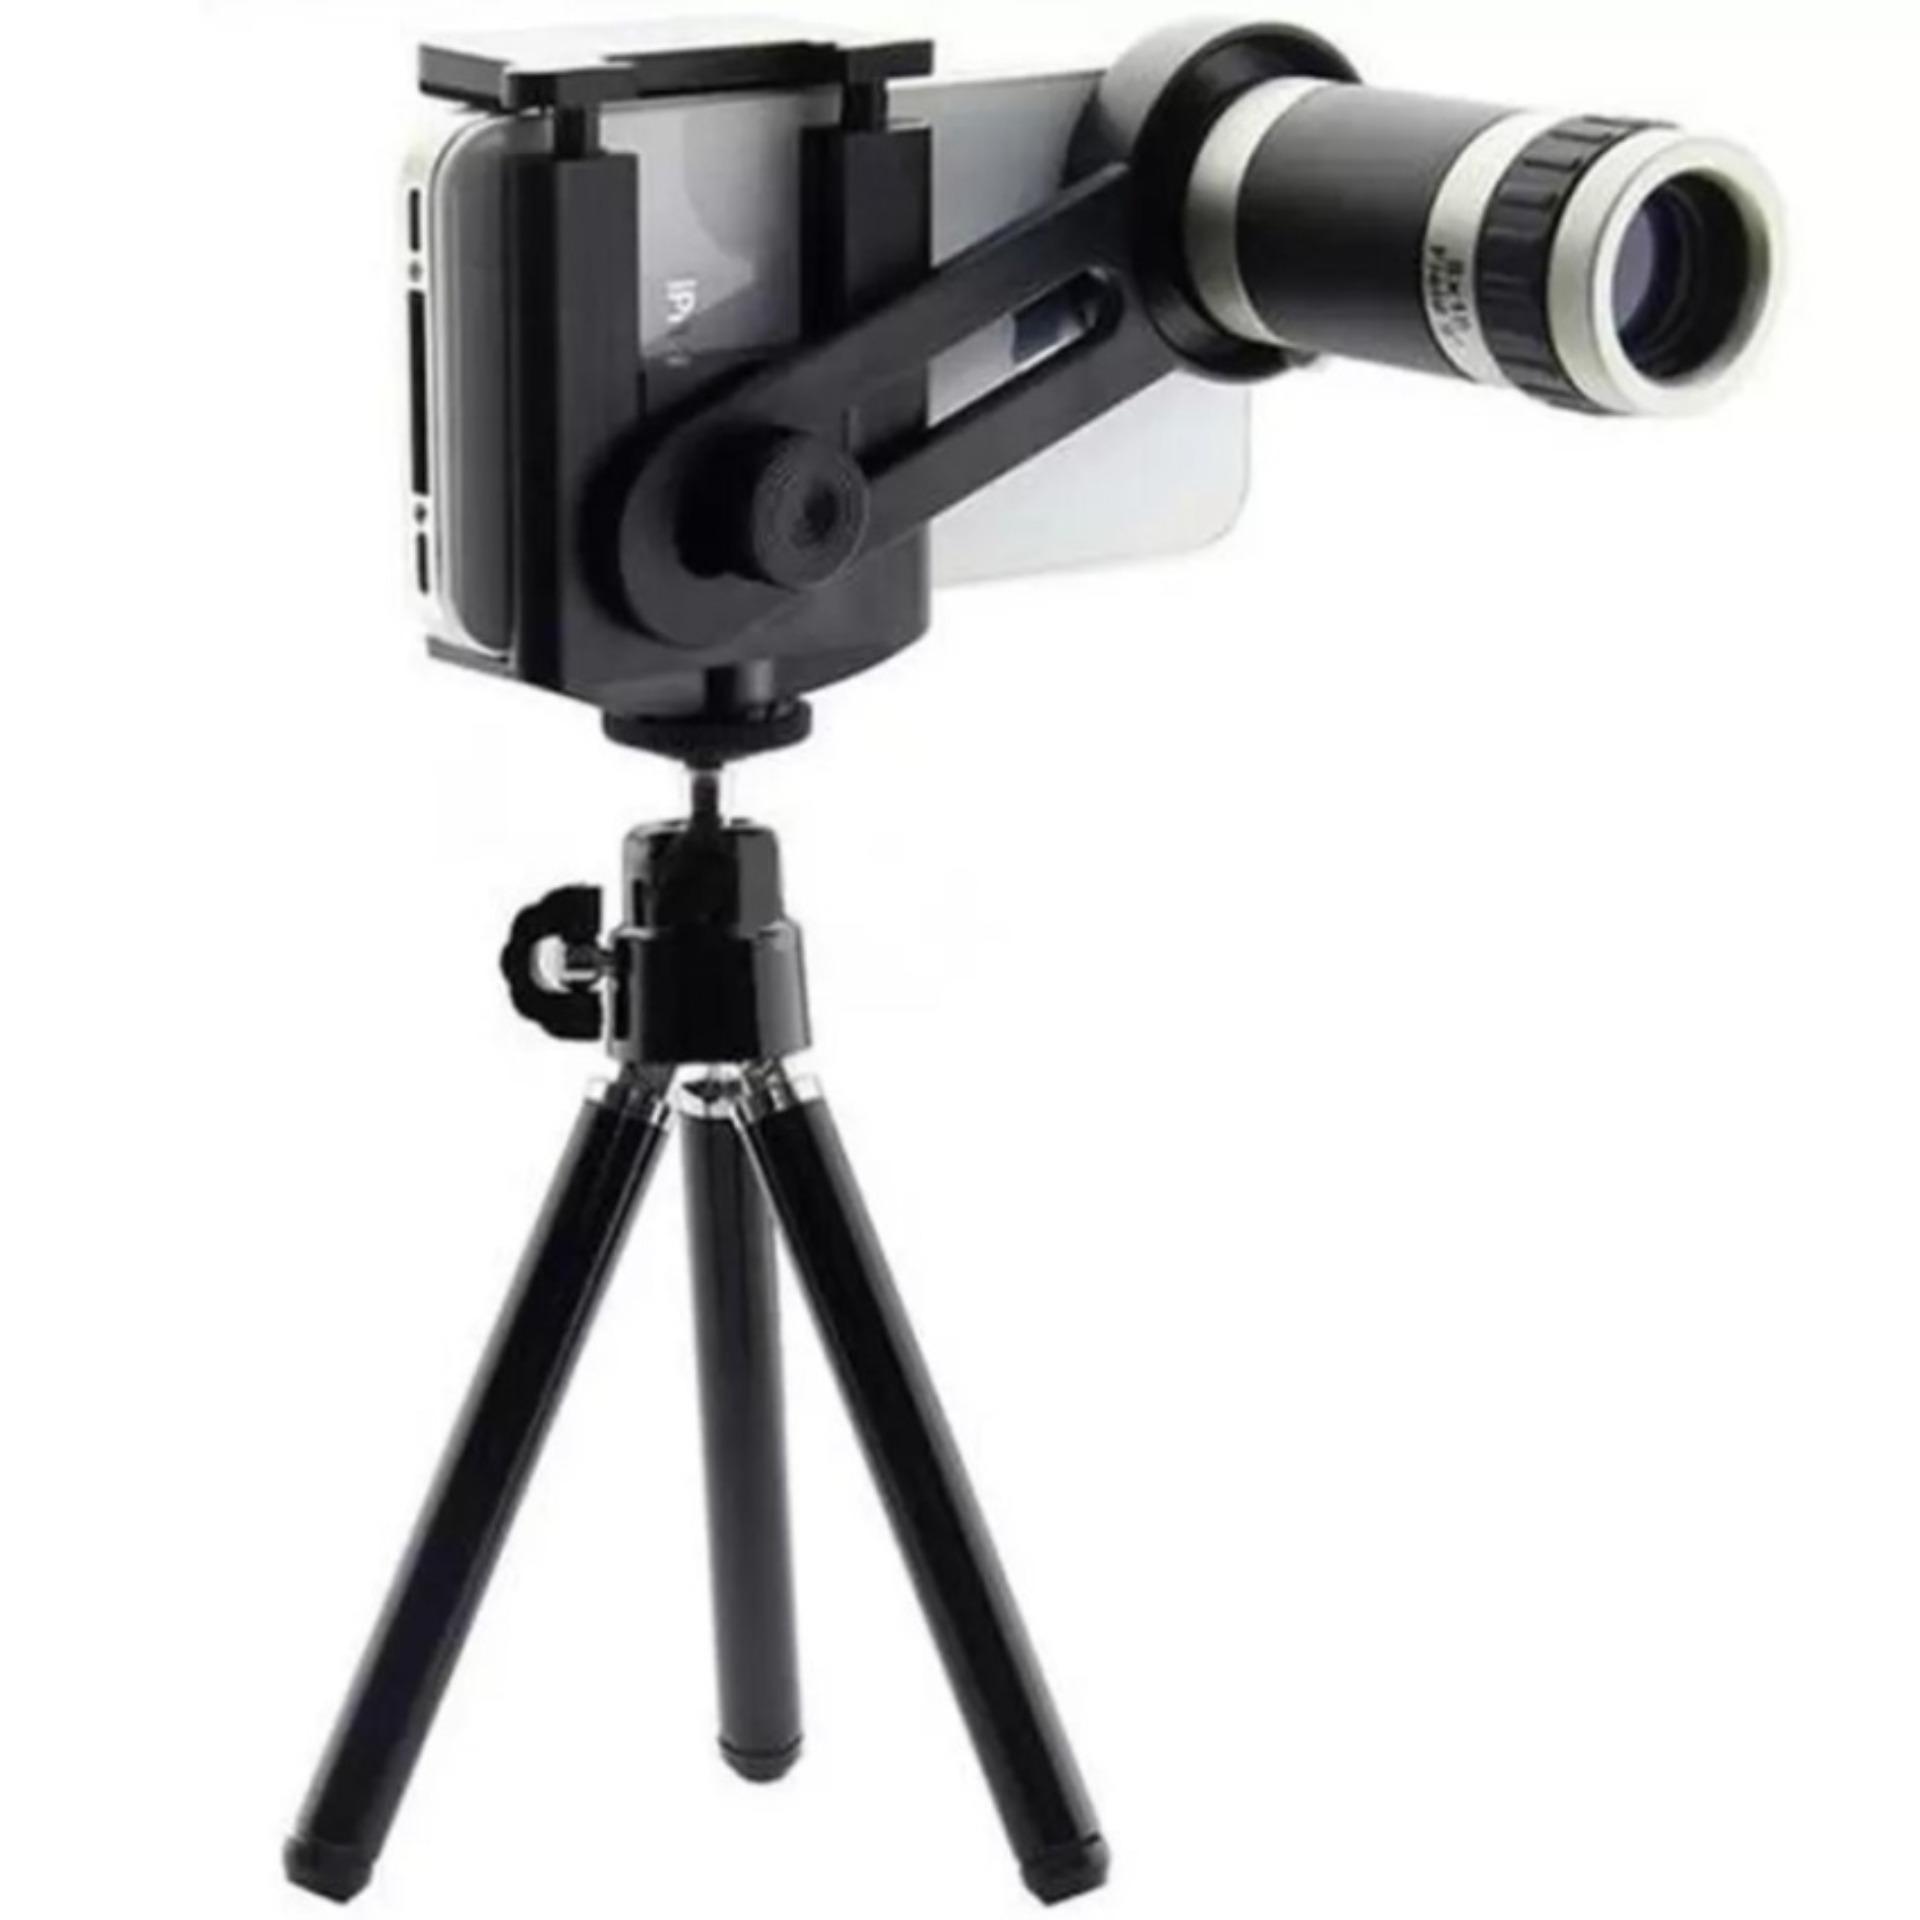 Hot Deals TRIPOD TELEZOOM - Lensa Telezoom 8x for Smartphone Include Tripod Mini - Hitam terbaik